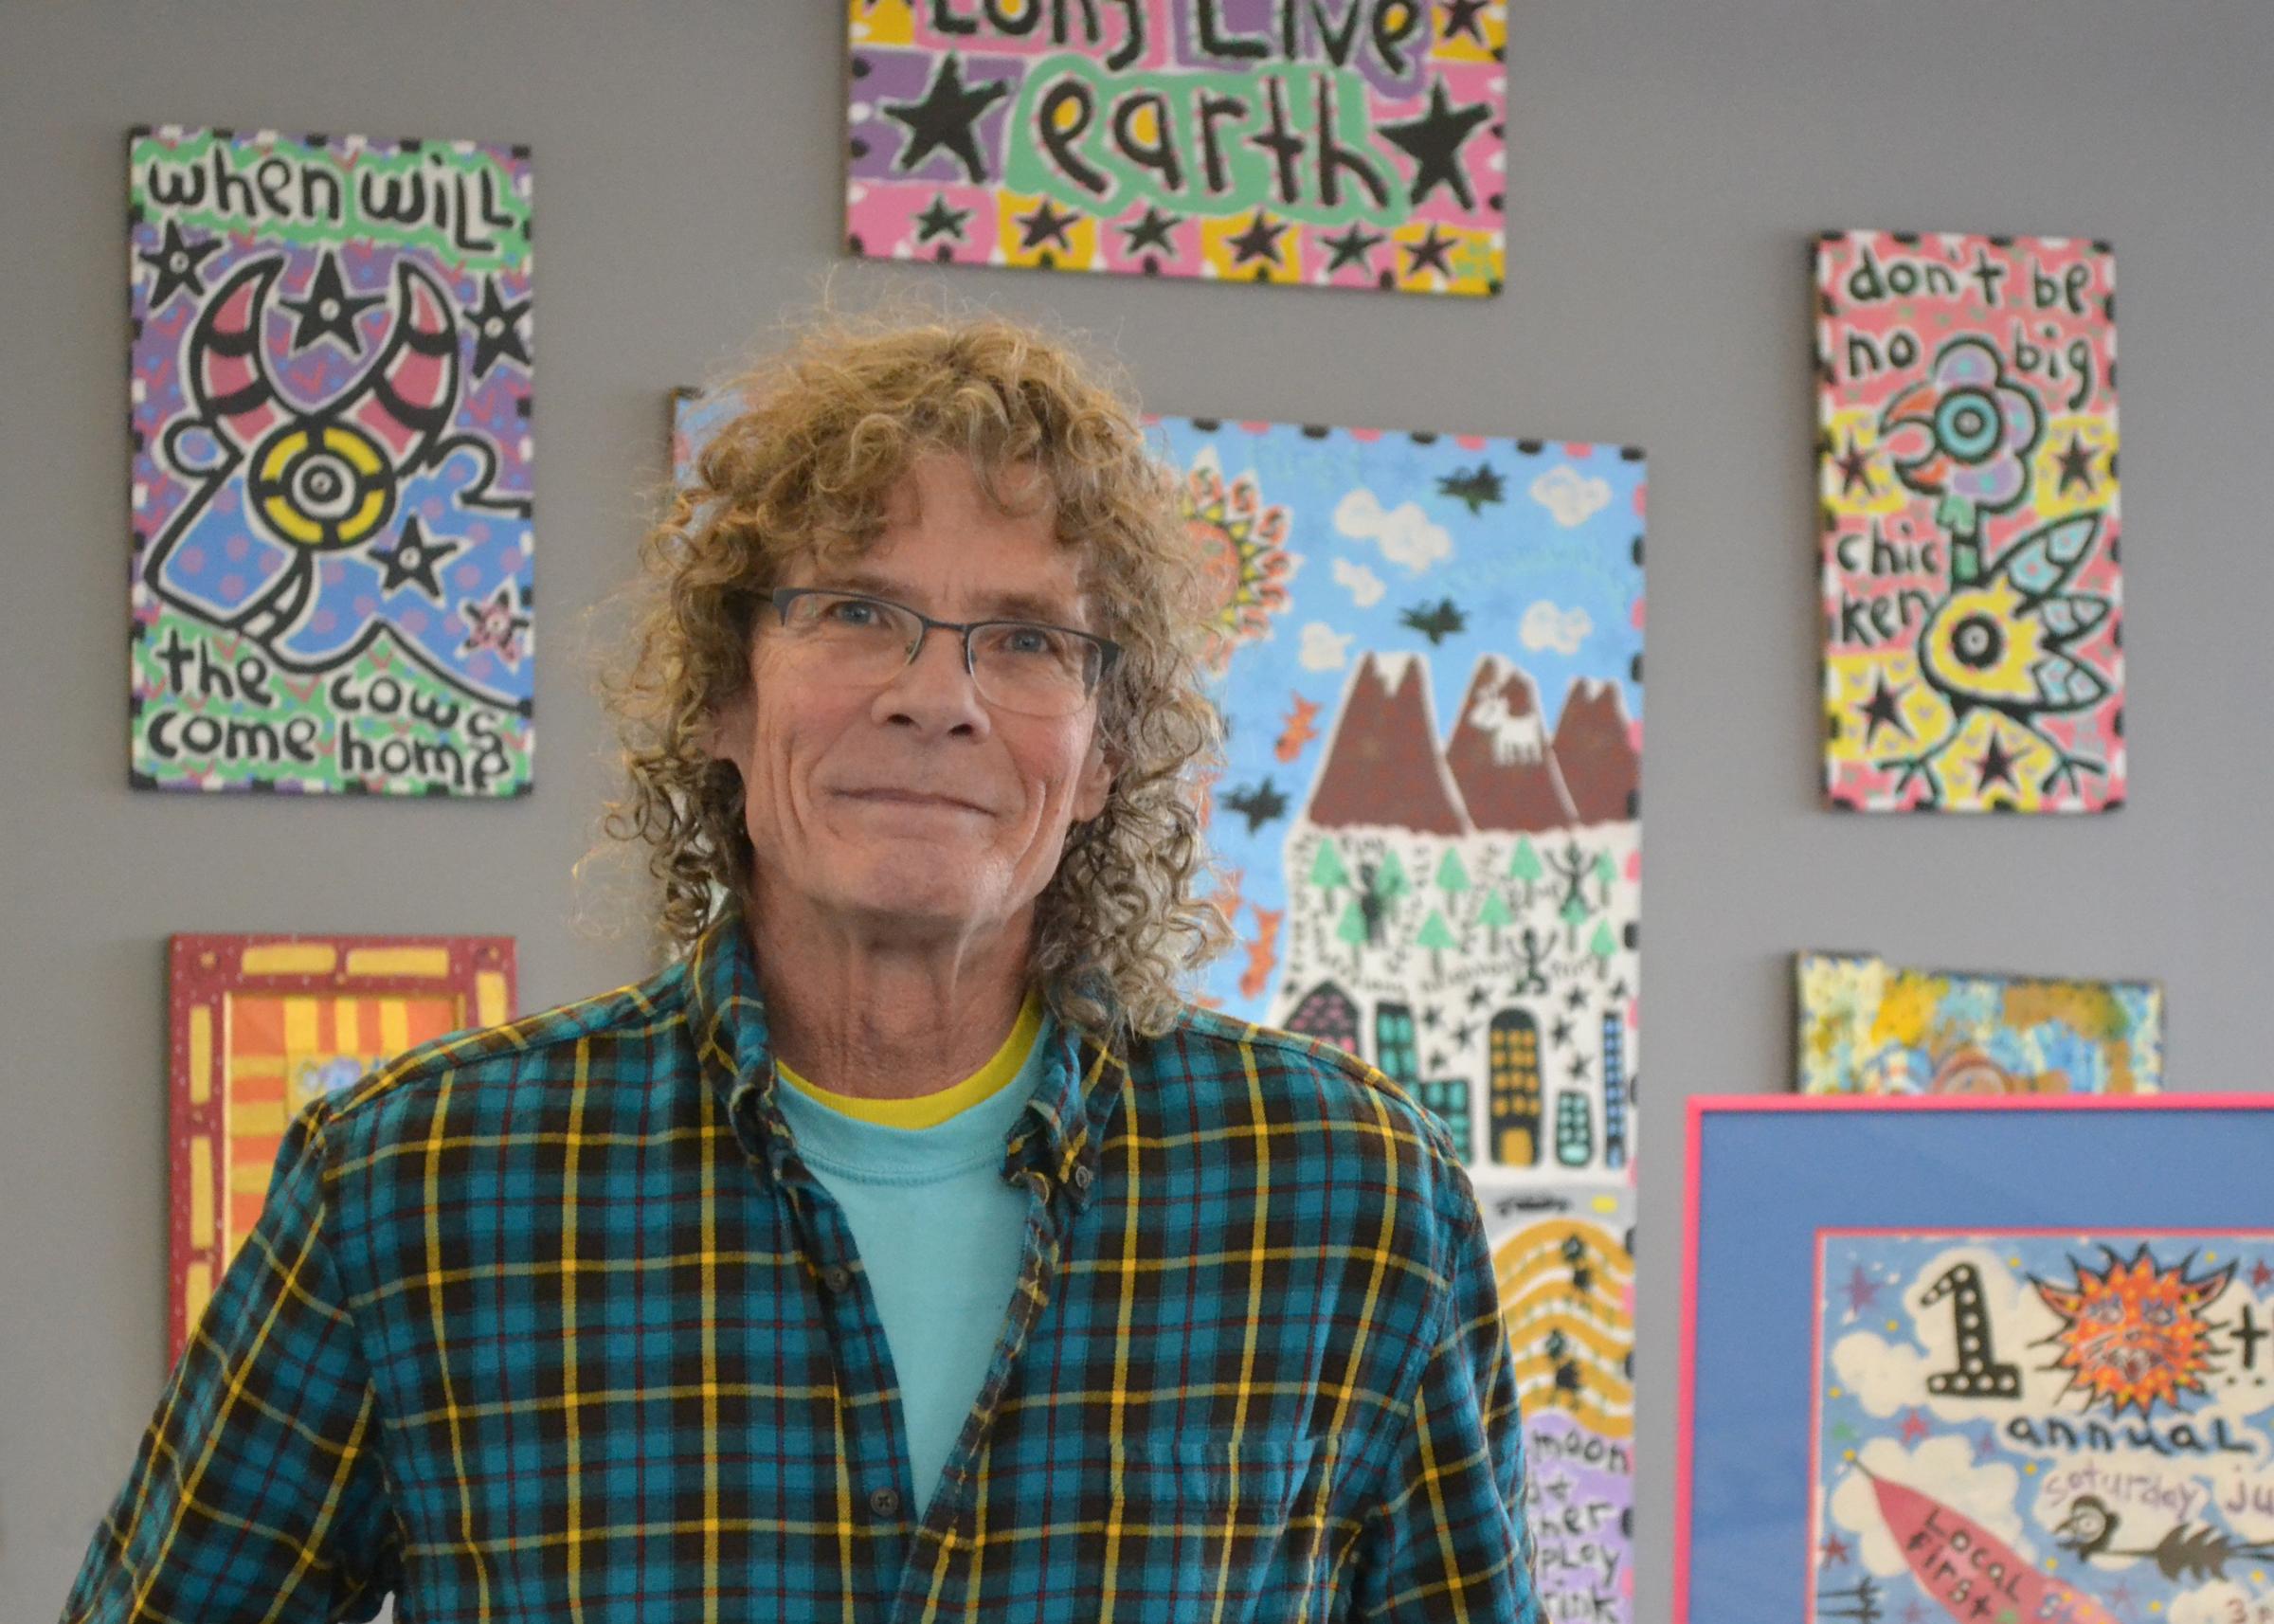 Artist Reb Roberts